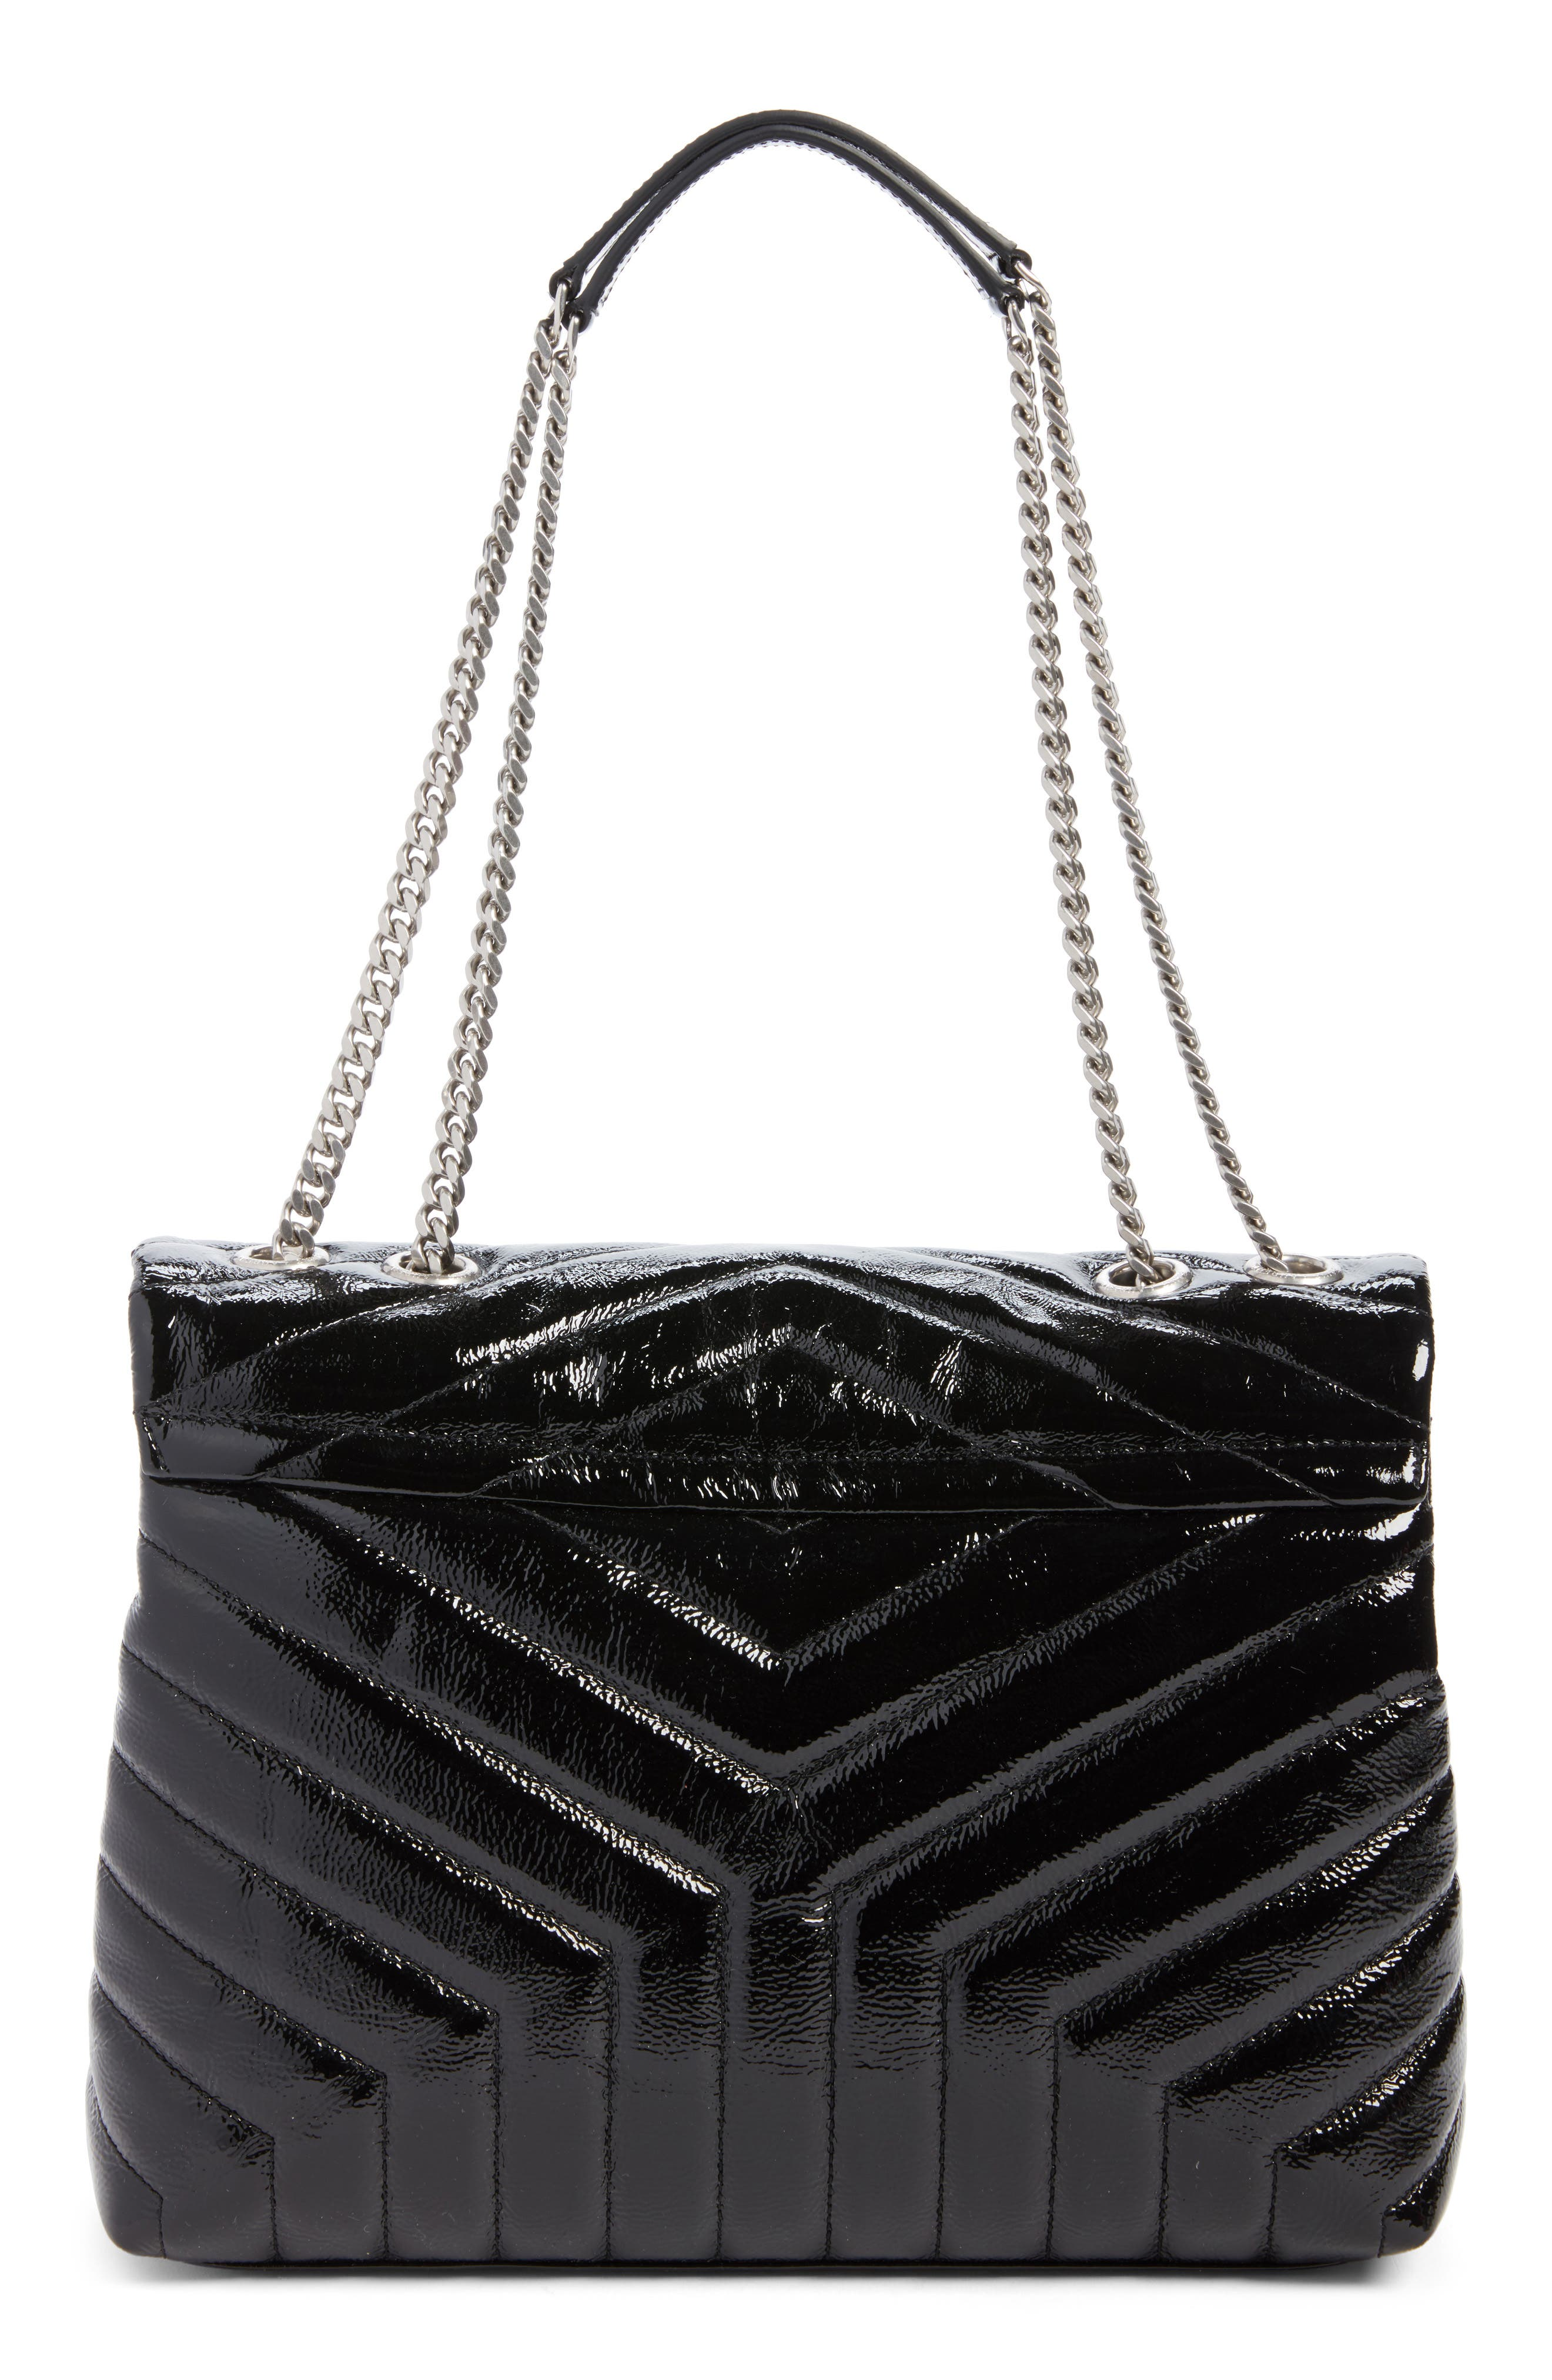 Medium Loulou Patent Leather Shoulder Bag,                             Alternate thumbnail 3, color,                             001